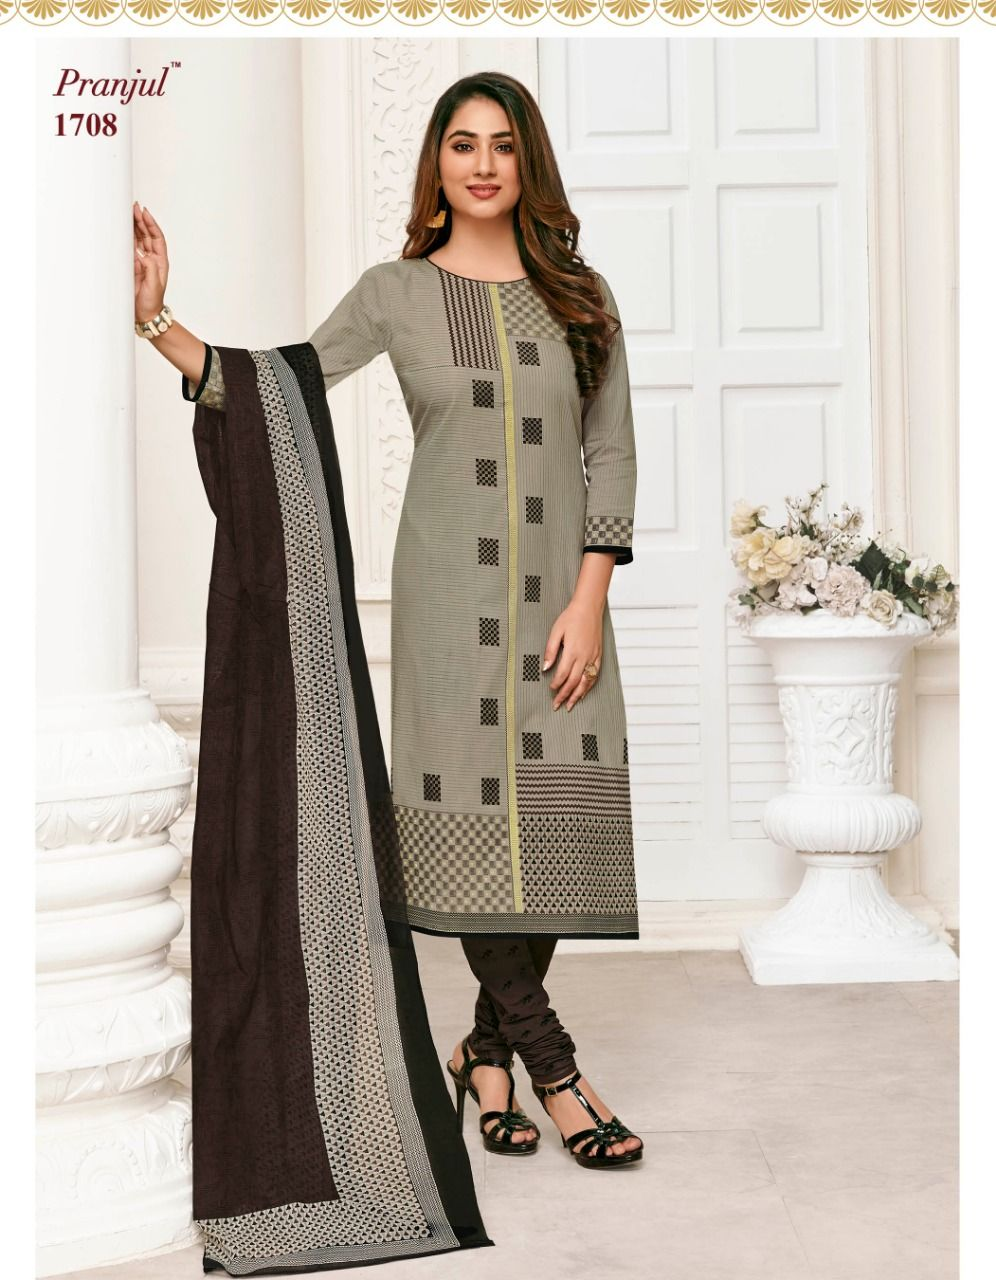 88e1925217 Pranjal Priyanka Vol-17 Cotton Dress Materials (27 Pc Set) | Cotton ...